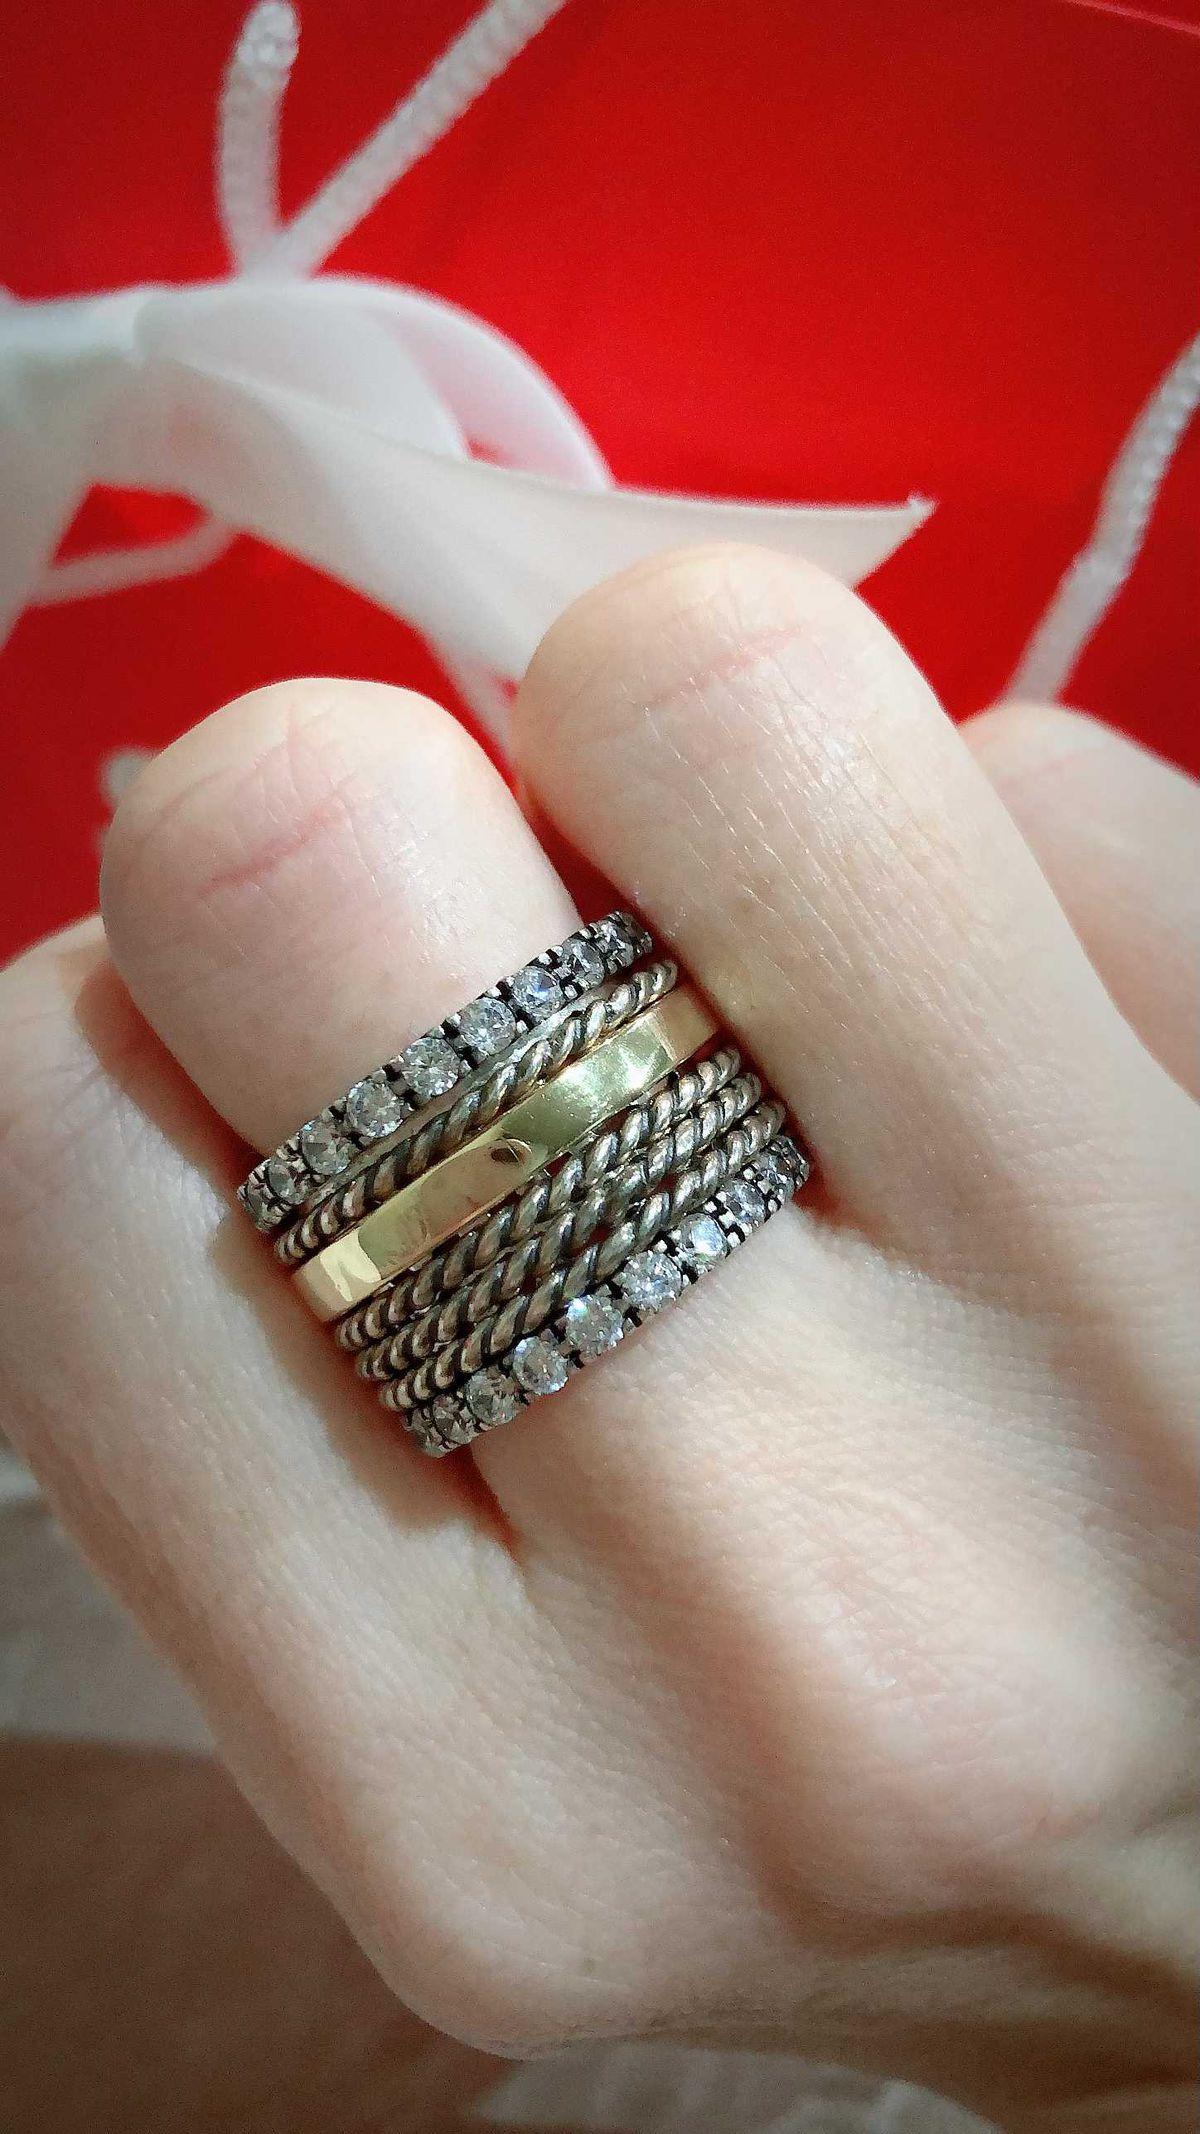 Нереальное кольцо